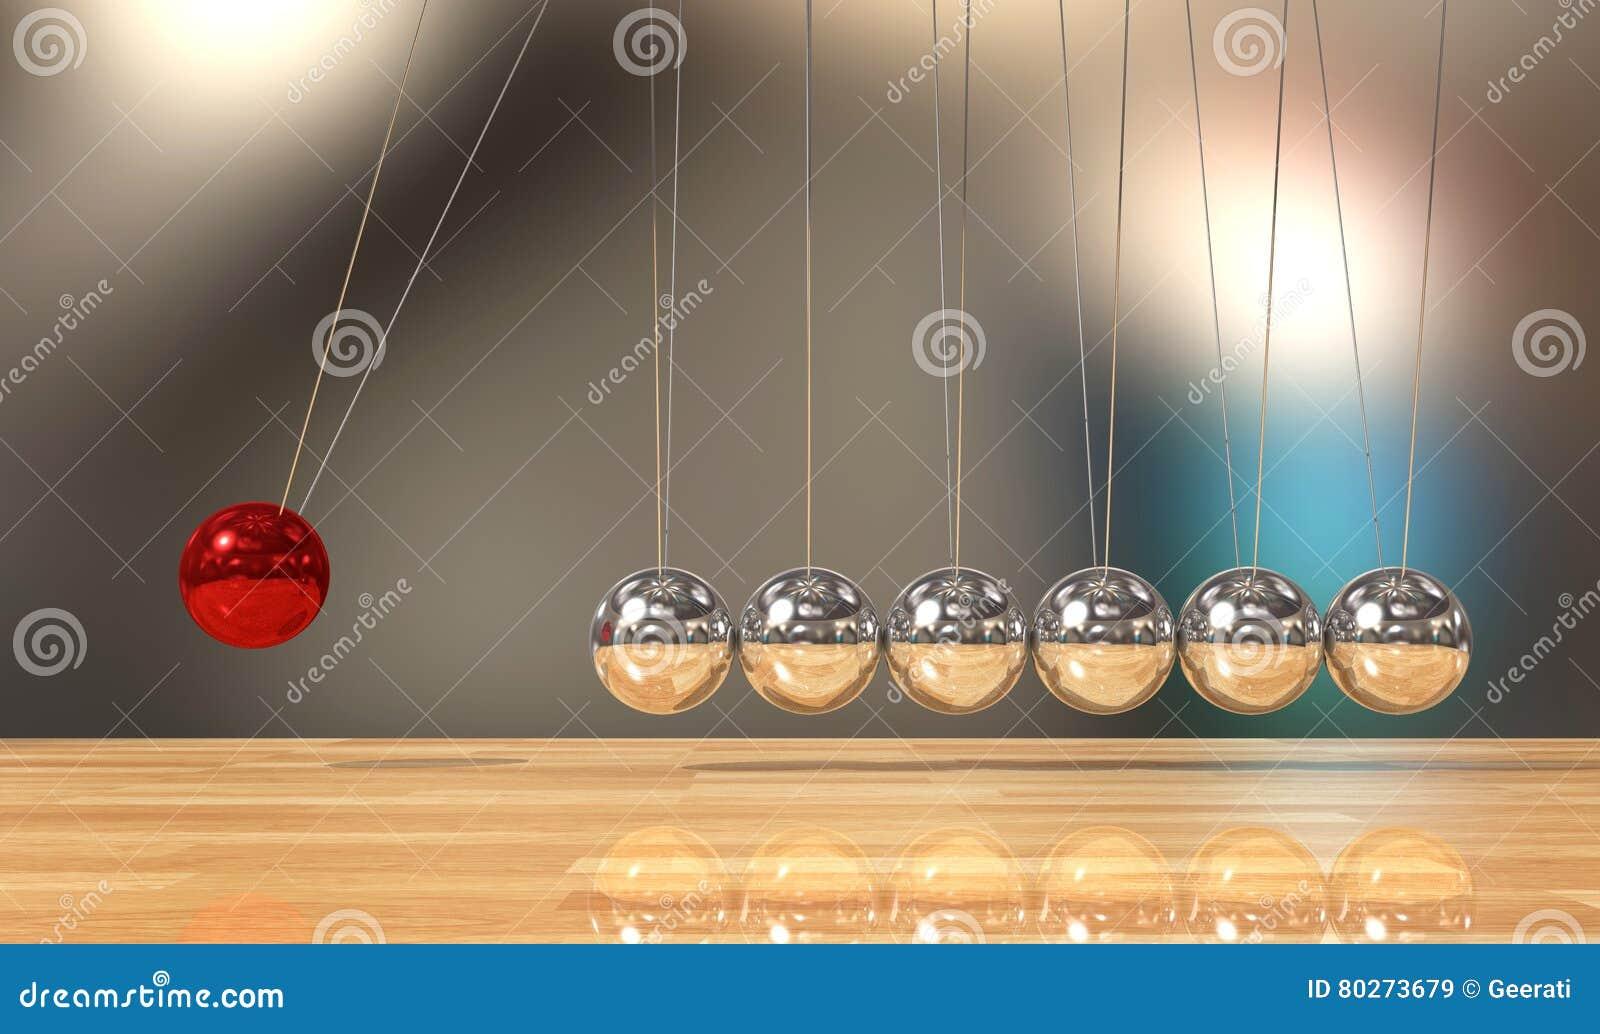 Balancing ball Newton`s cradle pendulum